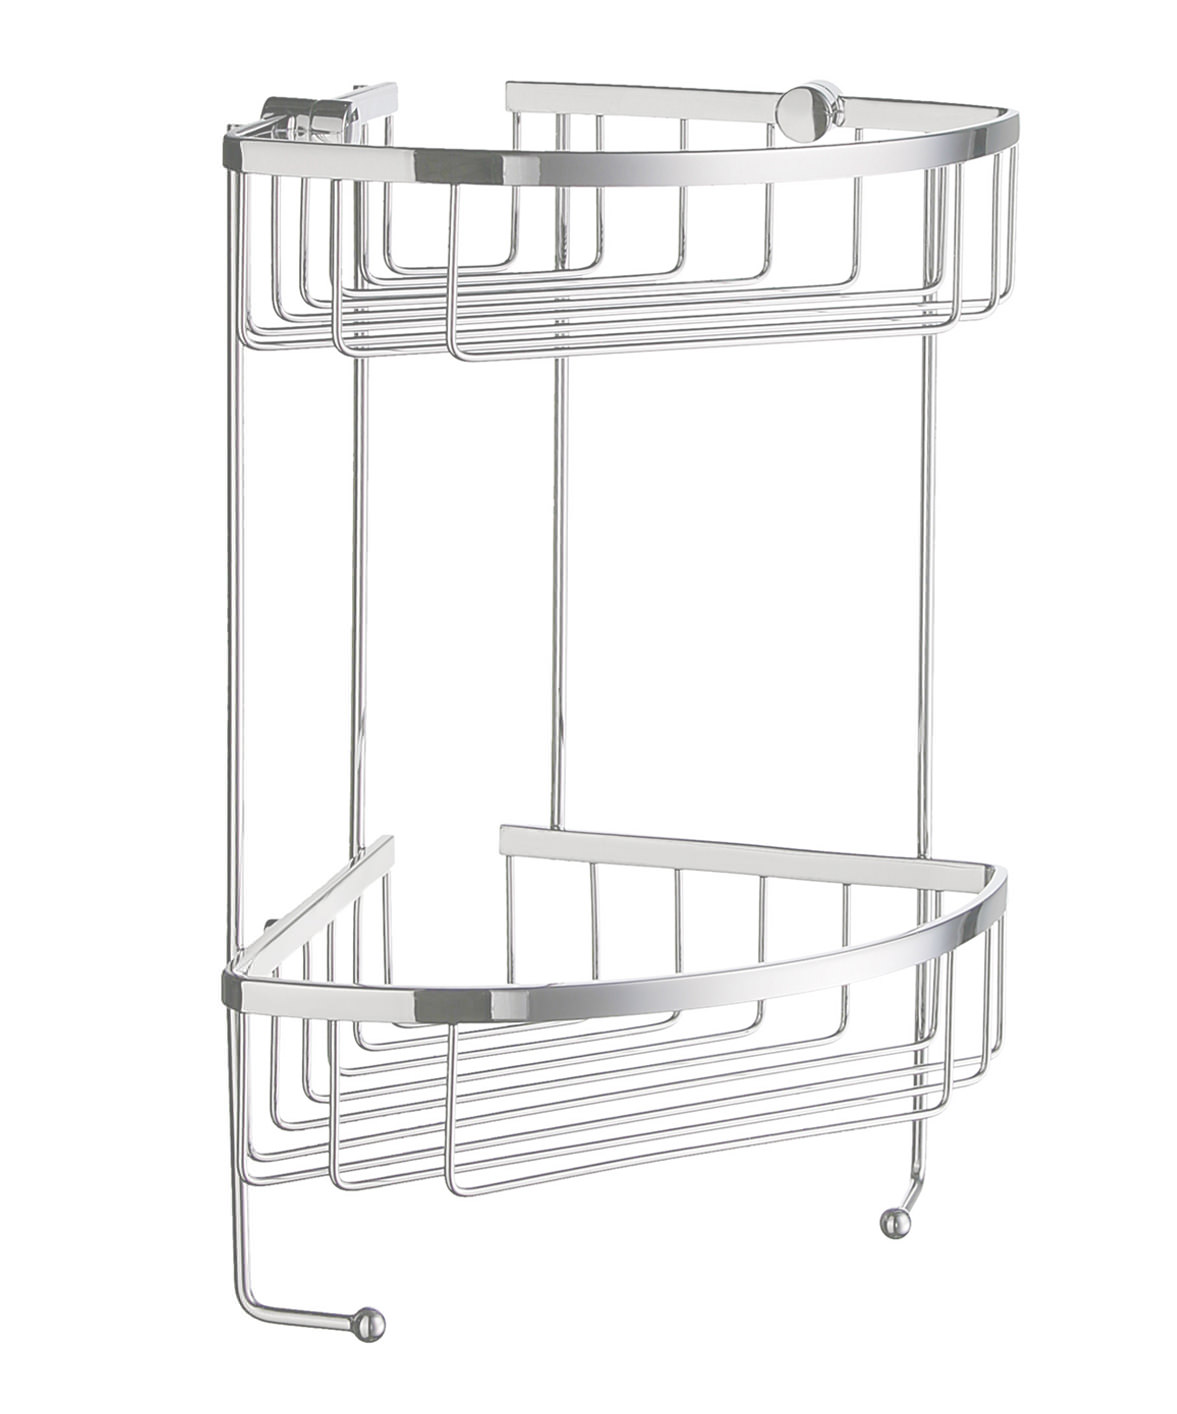 smedbo sideline design soap basket corner  level  dk - smedbo sideline design soap basket corner  level